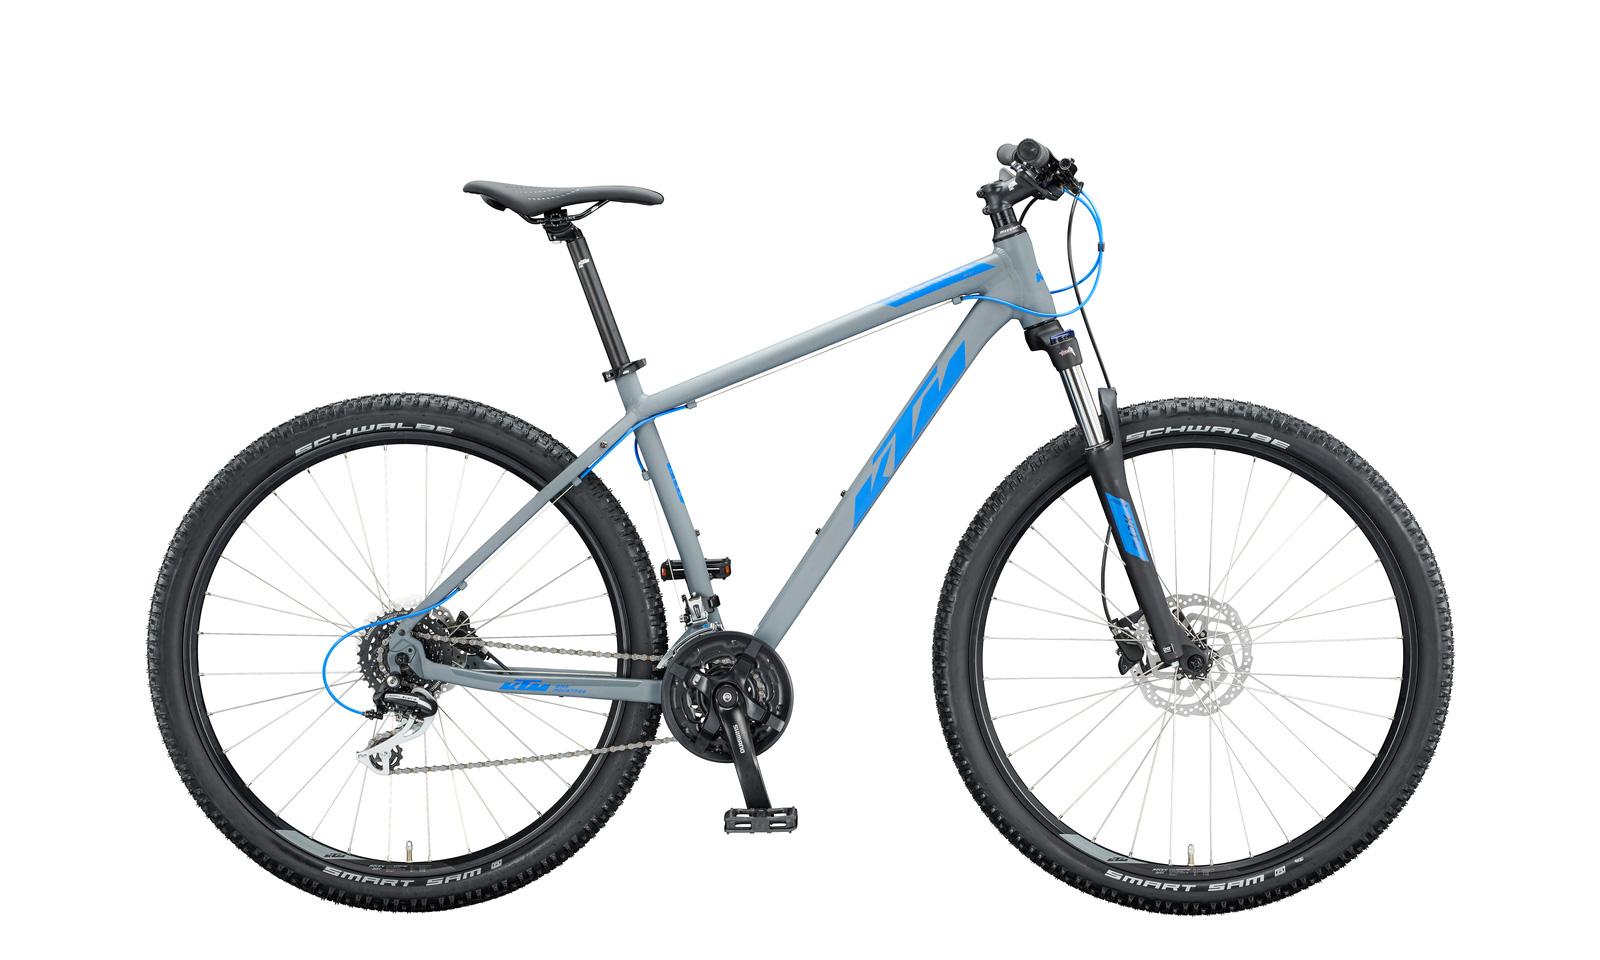 Biciclete KTM MTB Hardtail CHICAGO DISC-H 29.24 3x8 Shimano Acera